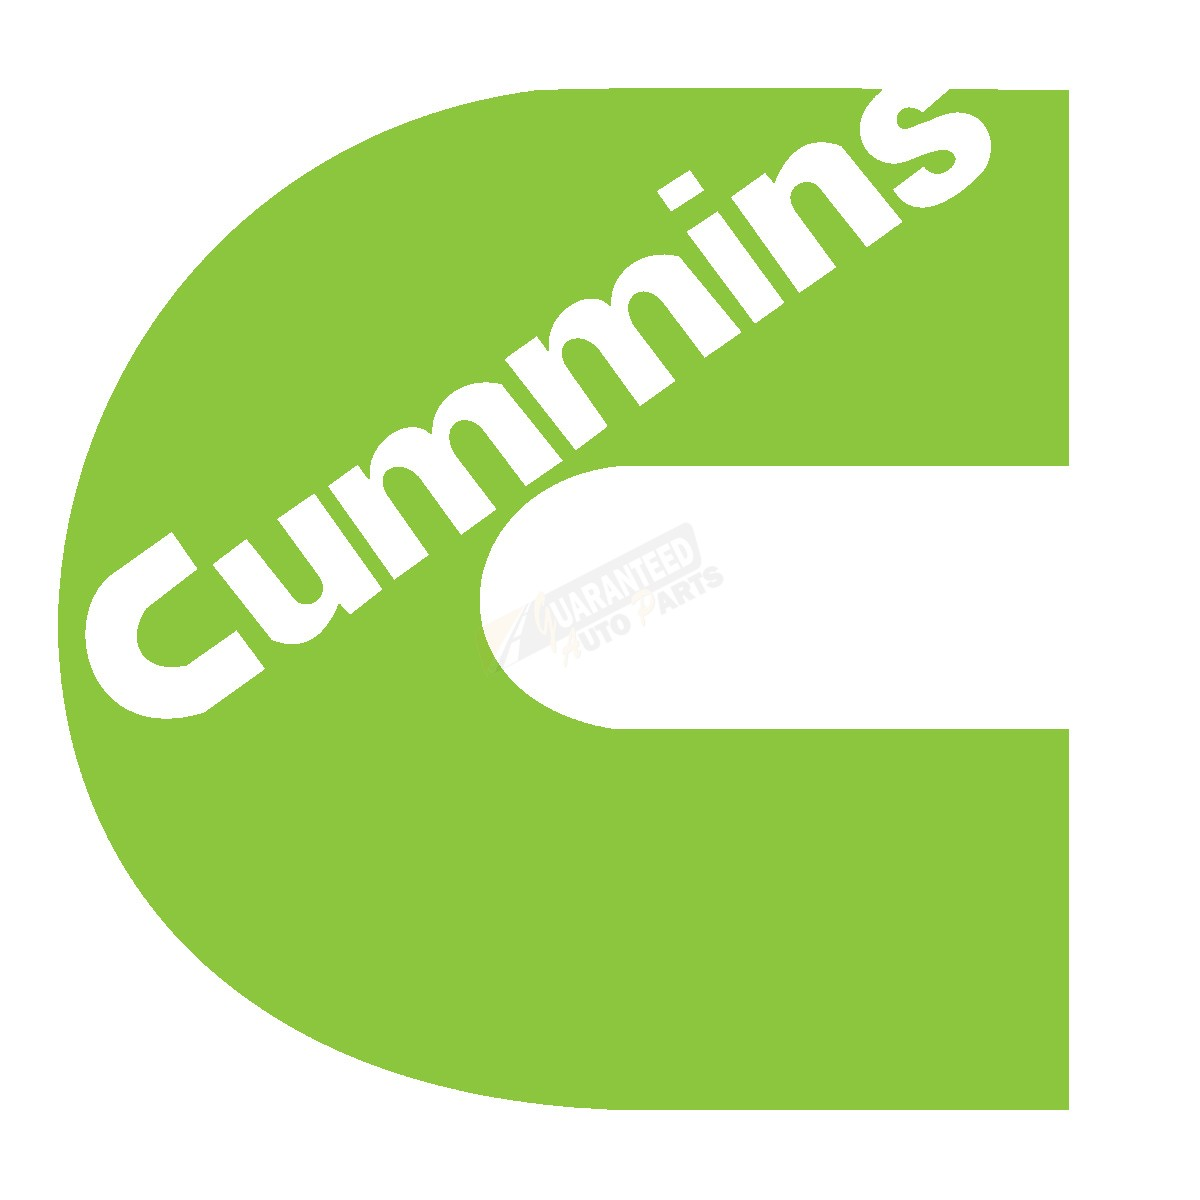 cummins logo decal 11quot lime green 550011063